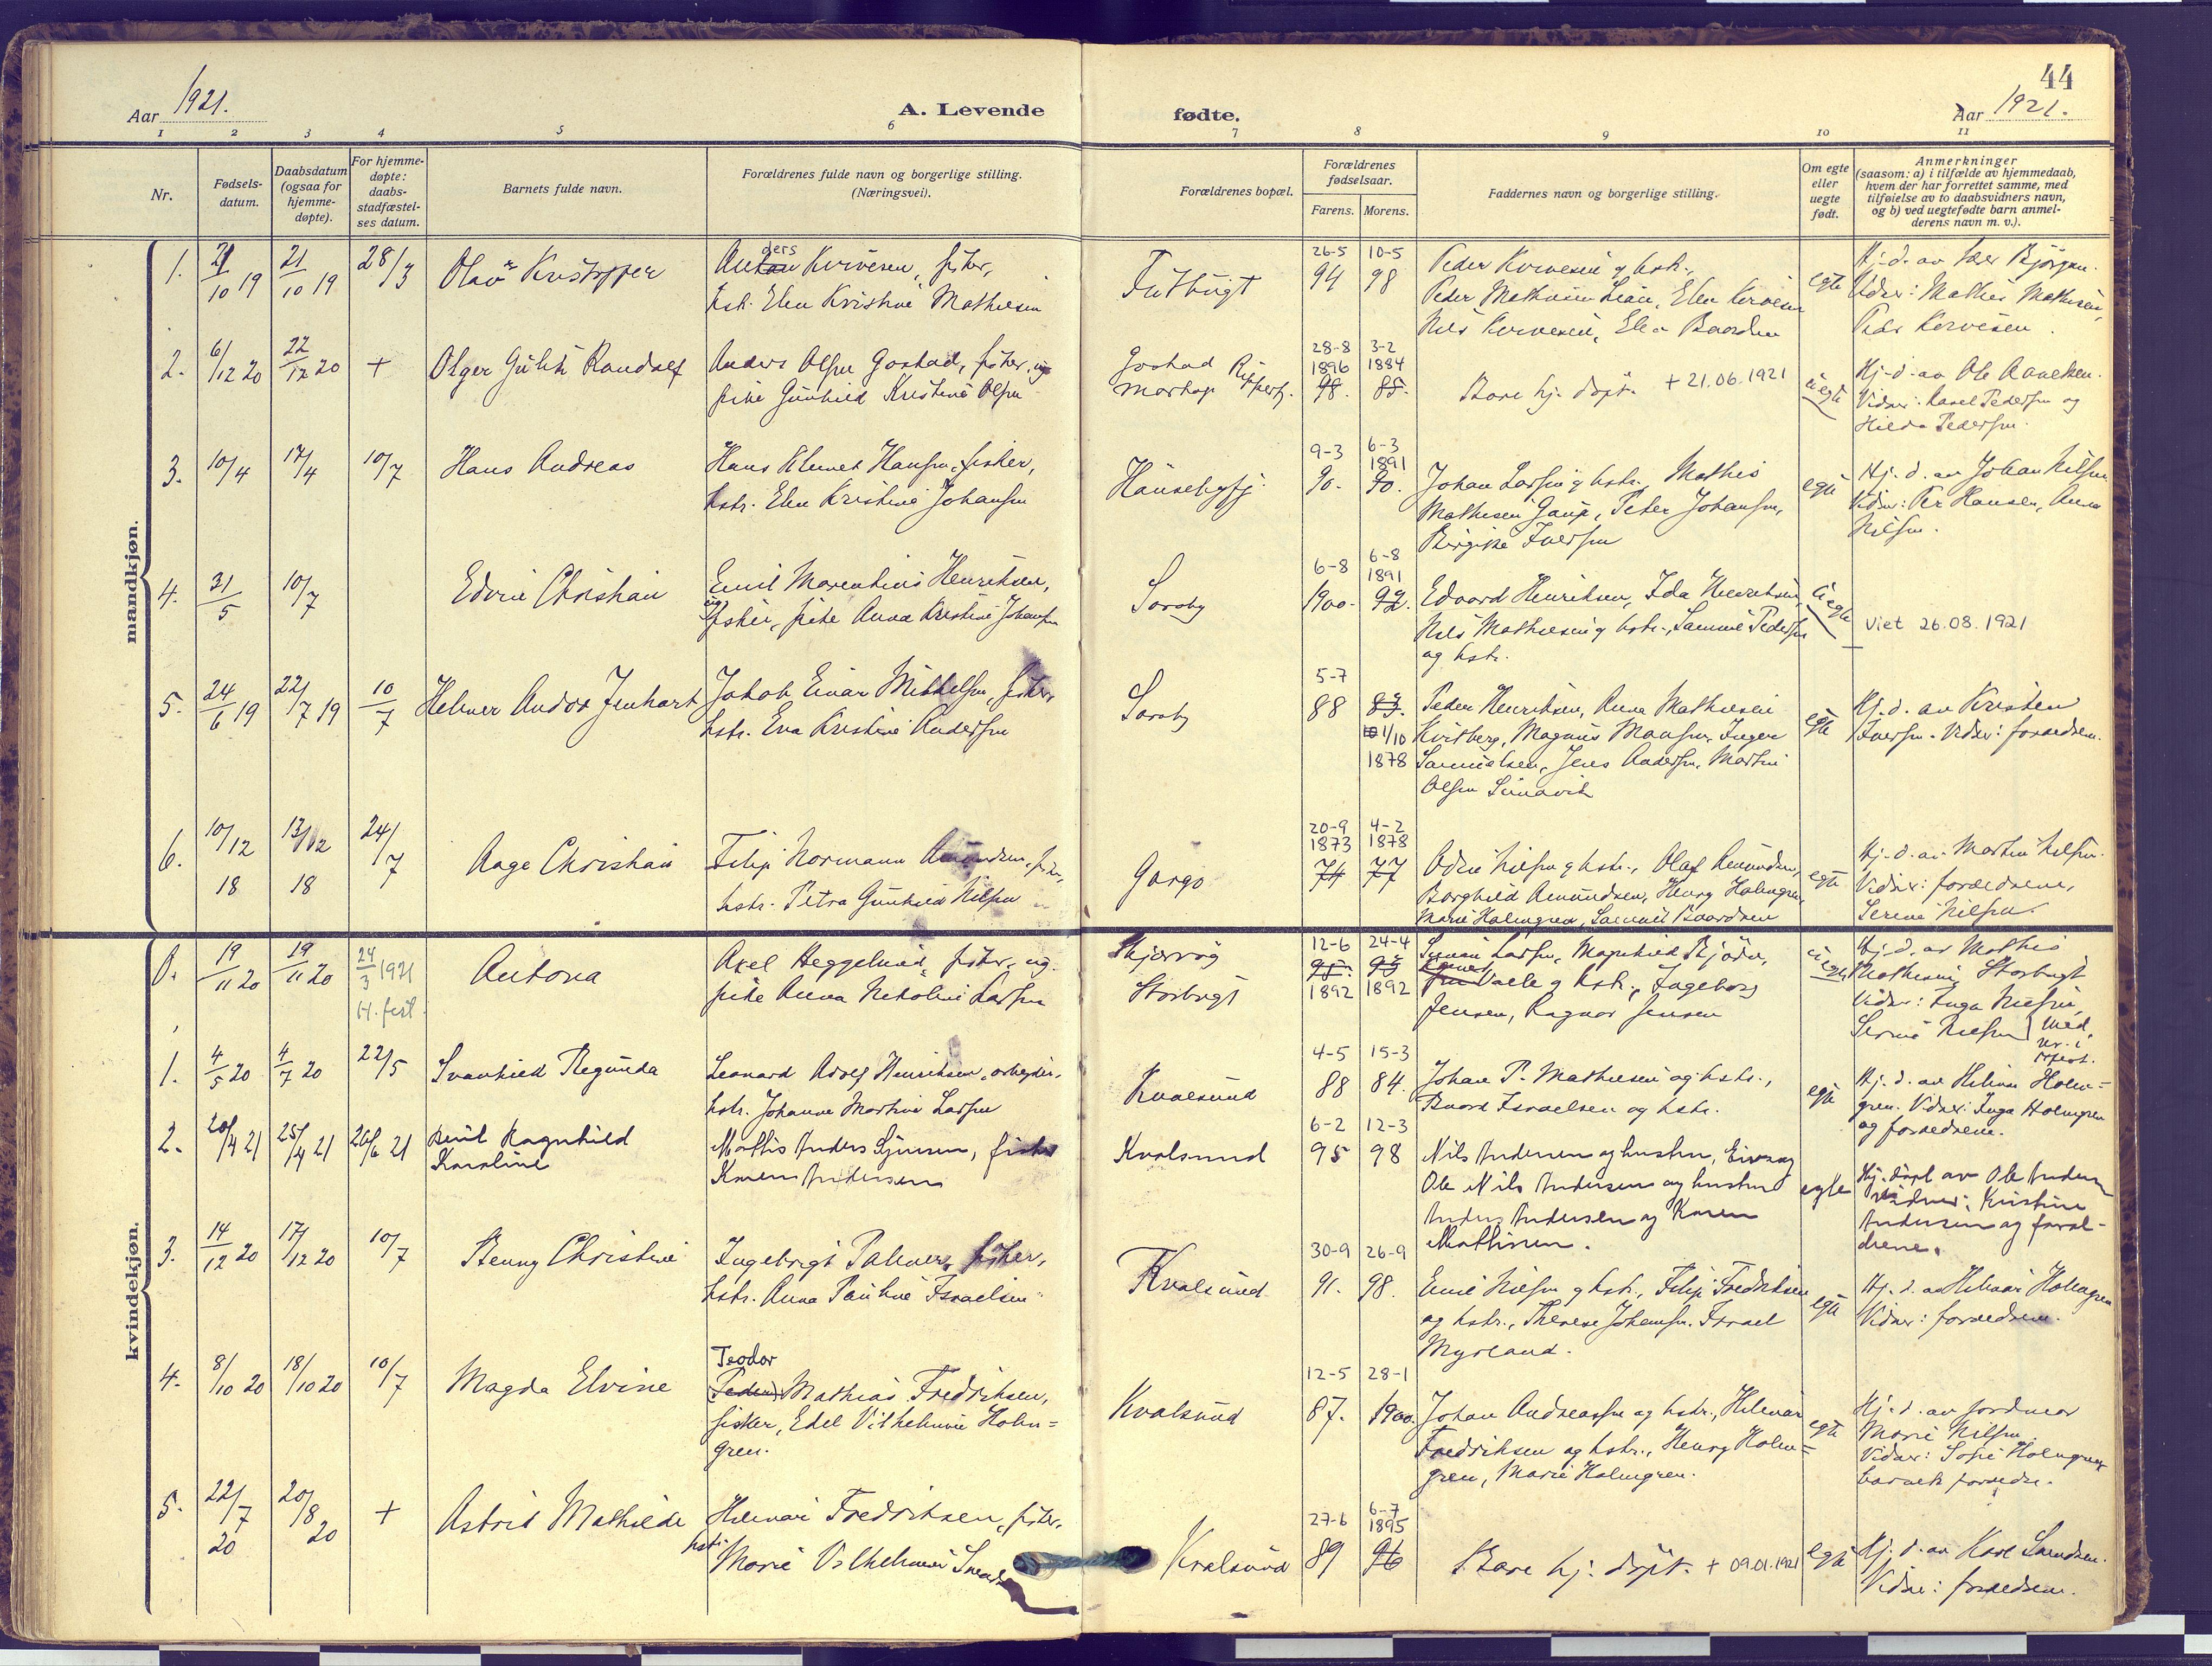 SATØ, Hammerfest sokneprestembete, Ministerialbok nr. 16, 1908-1923, s. 44